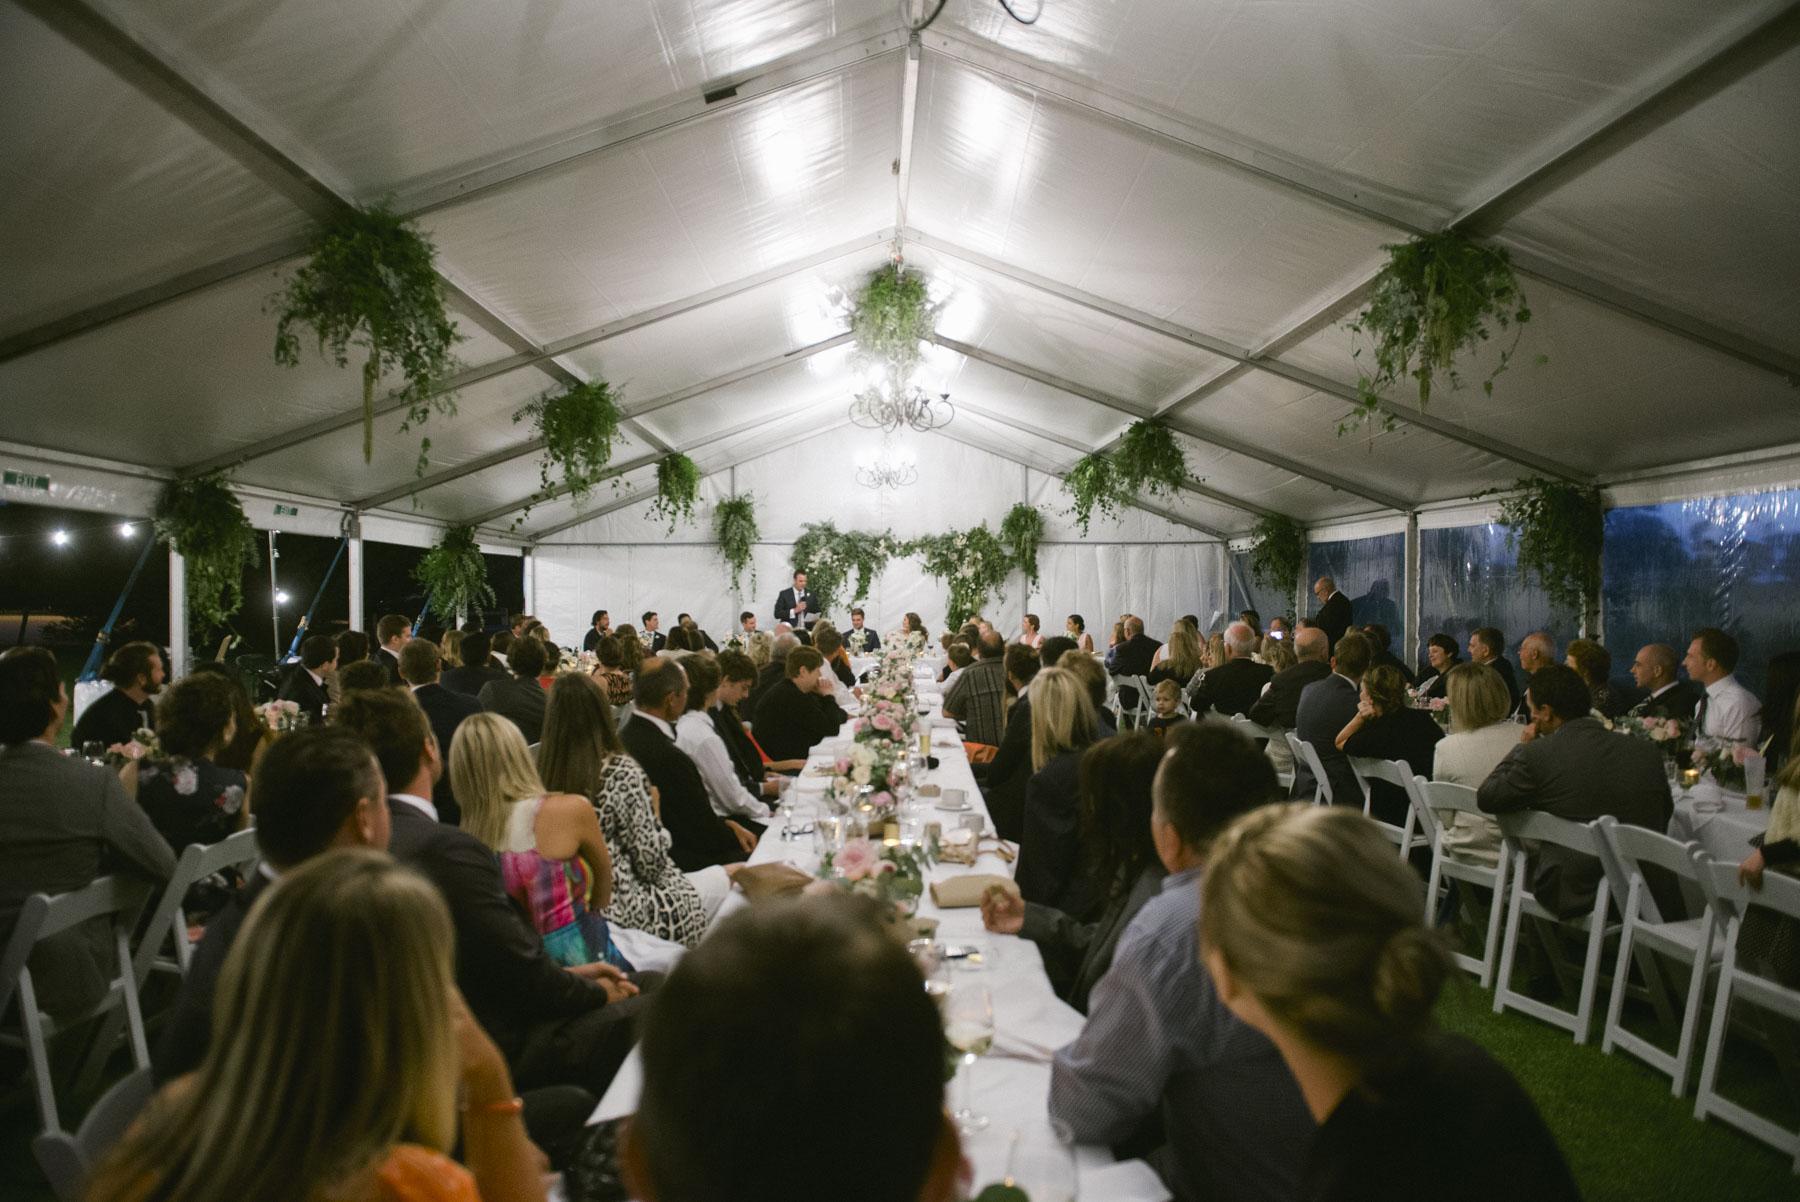 1501vand-424alan_moyle_wedding_portrait_brighton_bayside_werribee_estate_mansion_zoo_rustic_styled_garden_mansion_candid_documentry_victoria_whitelaw.jpg